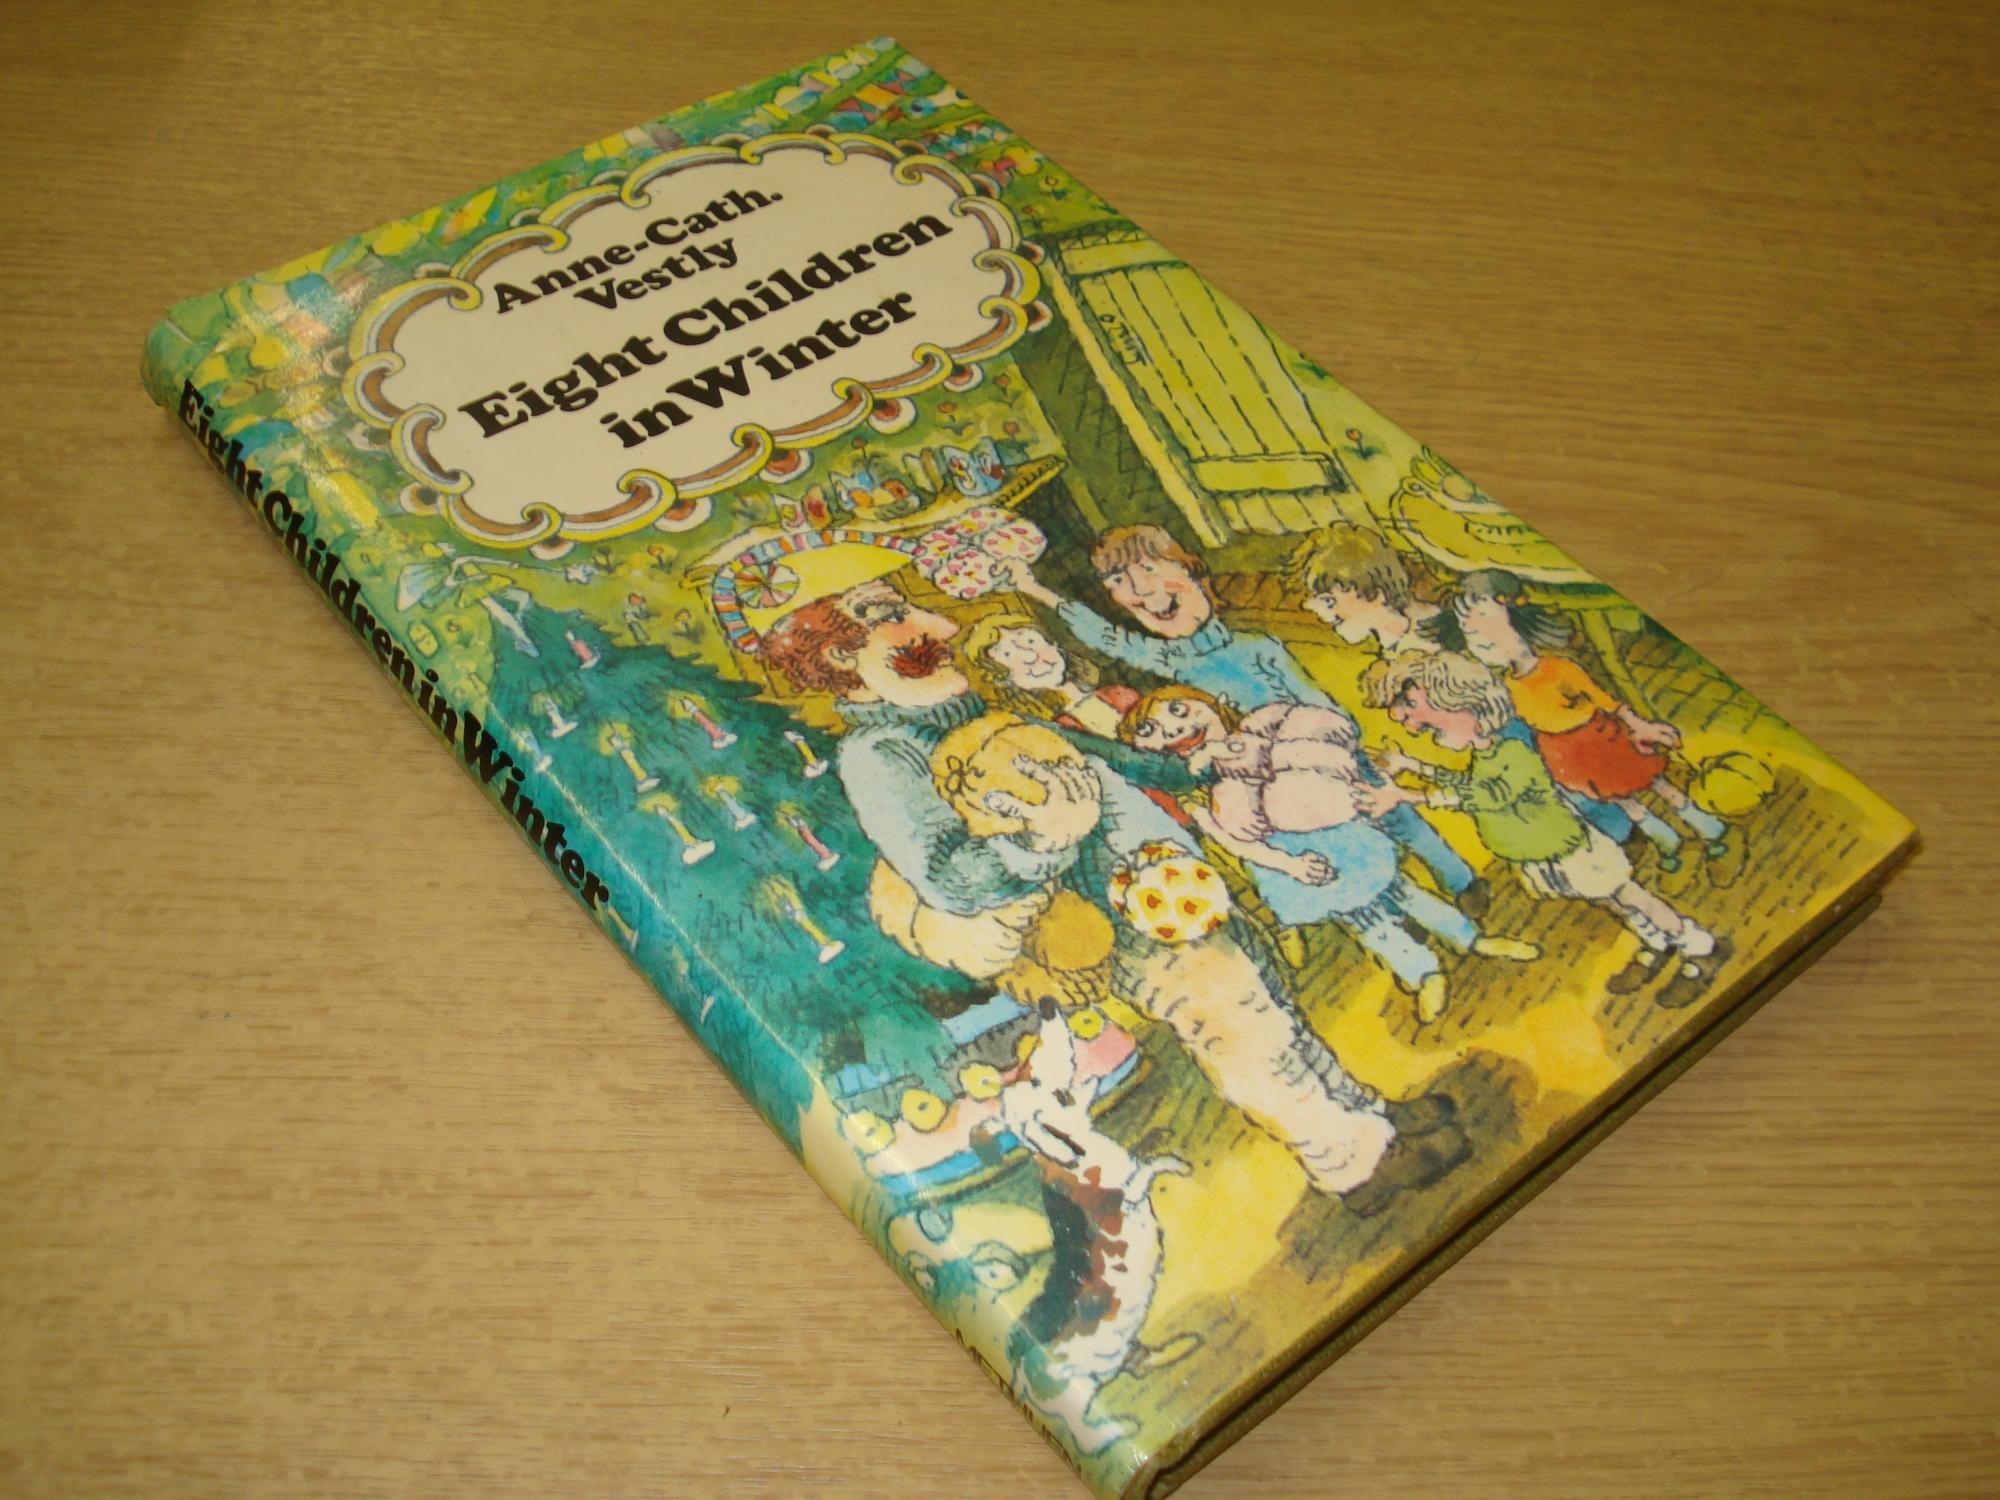 Eight Children in Winter: Vestly, Anne-Catharina